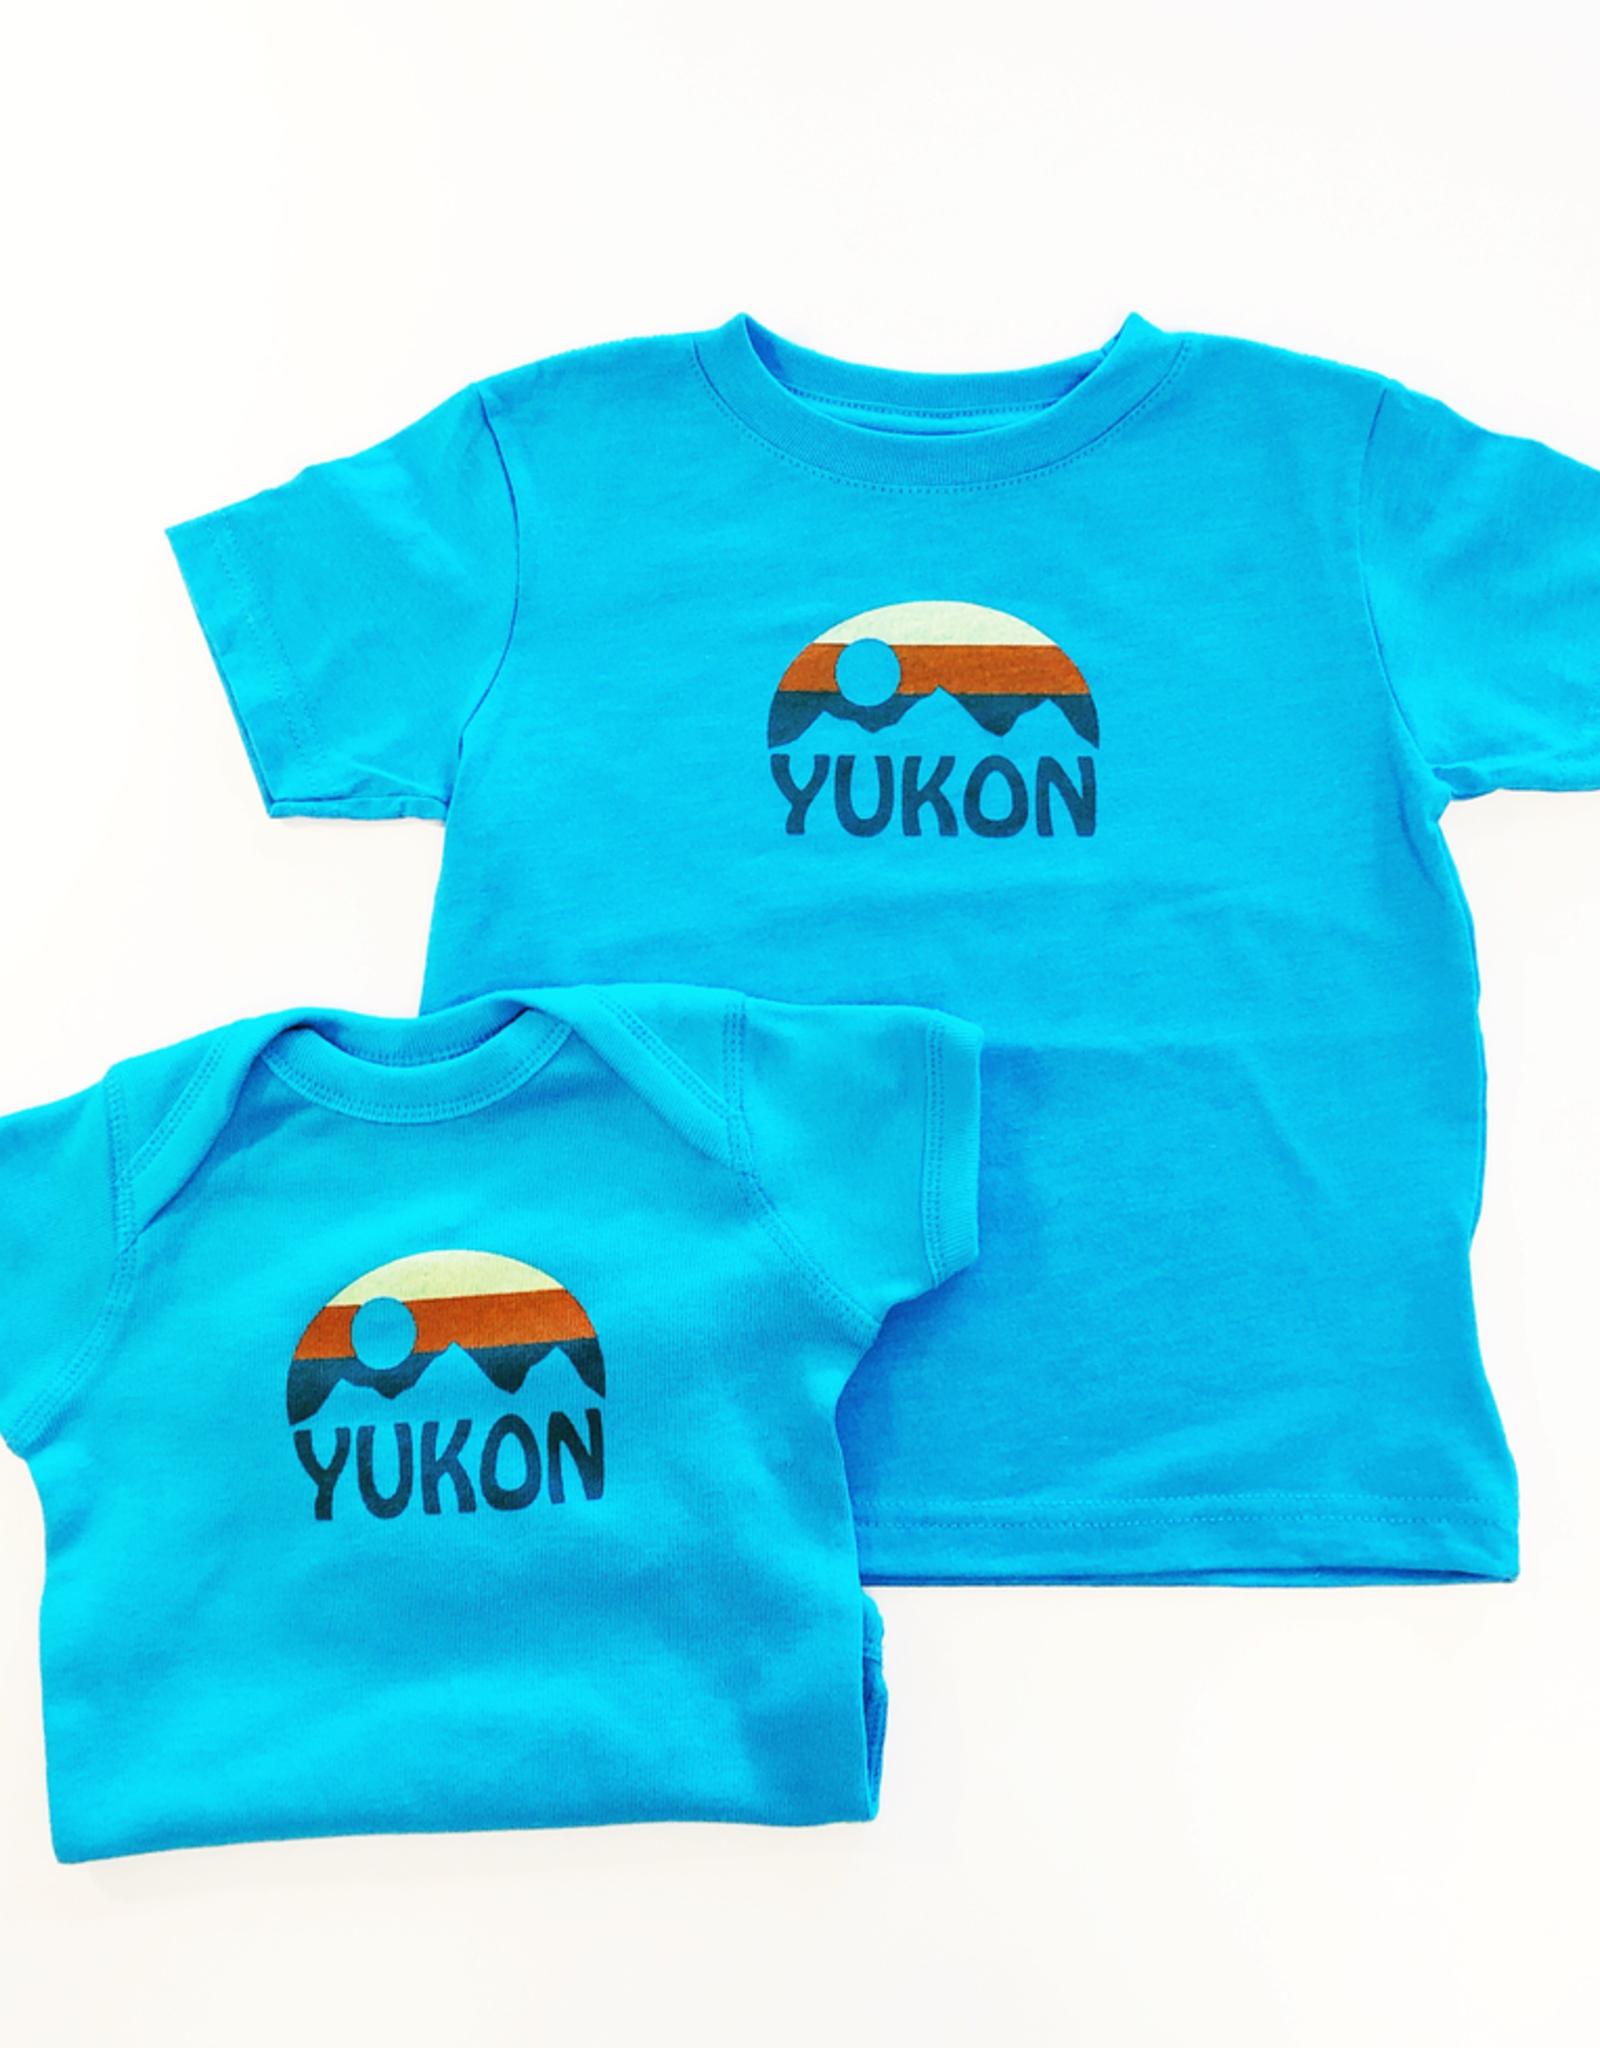 The Collective Good TCG Kid's Yukon Sun Tshirt